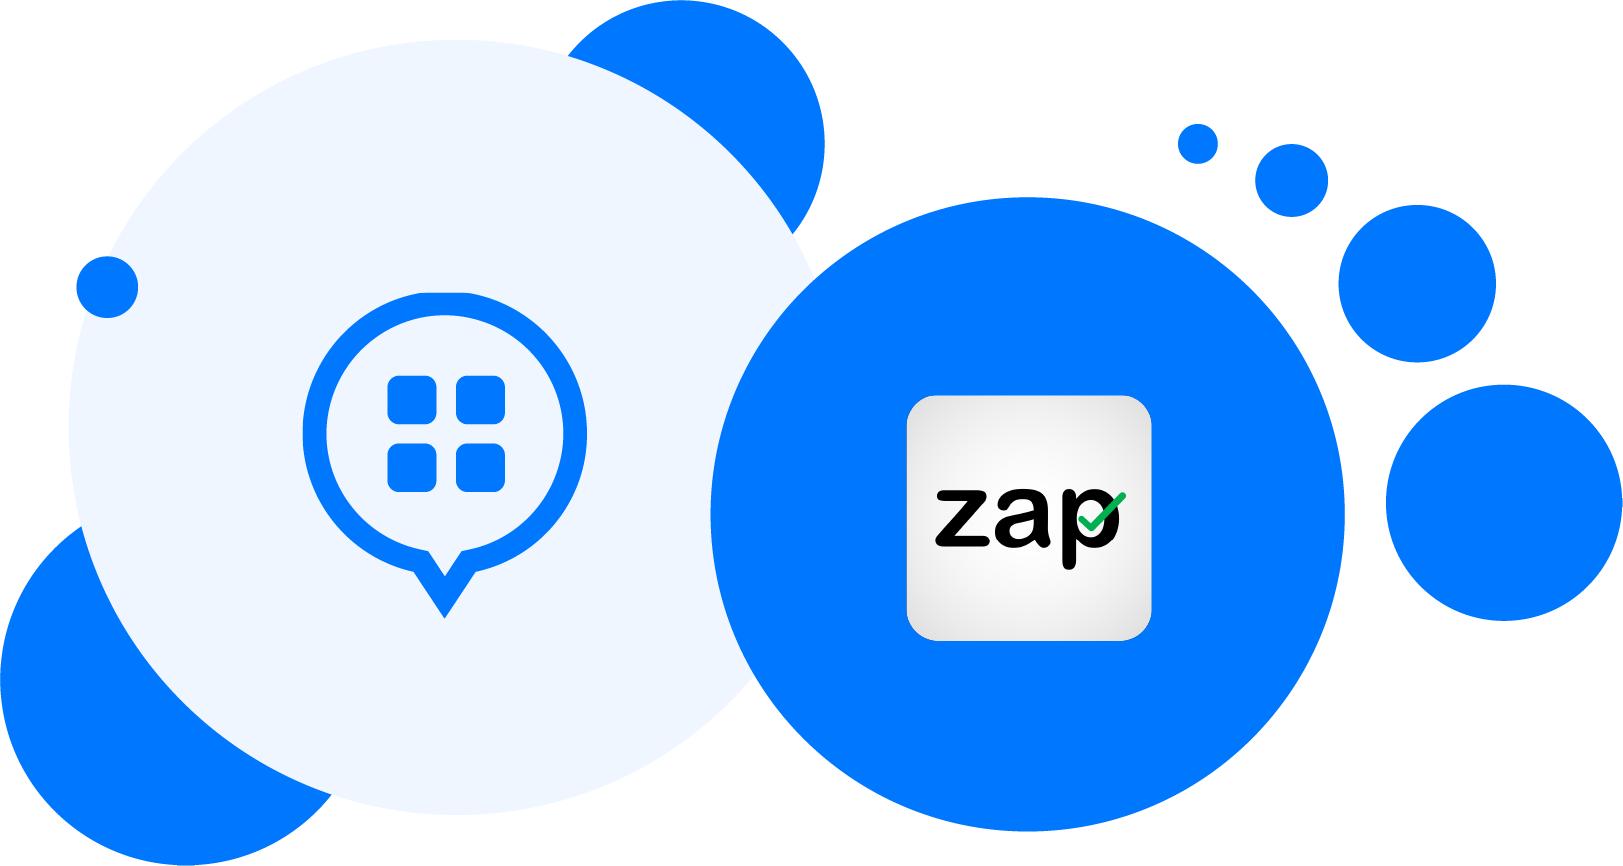 zap-surveys_case-study_hero-2